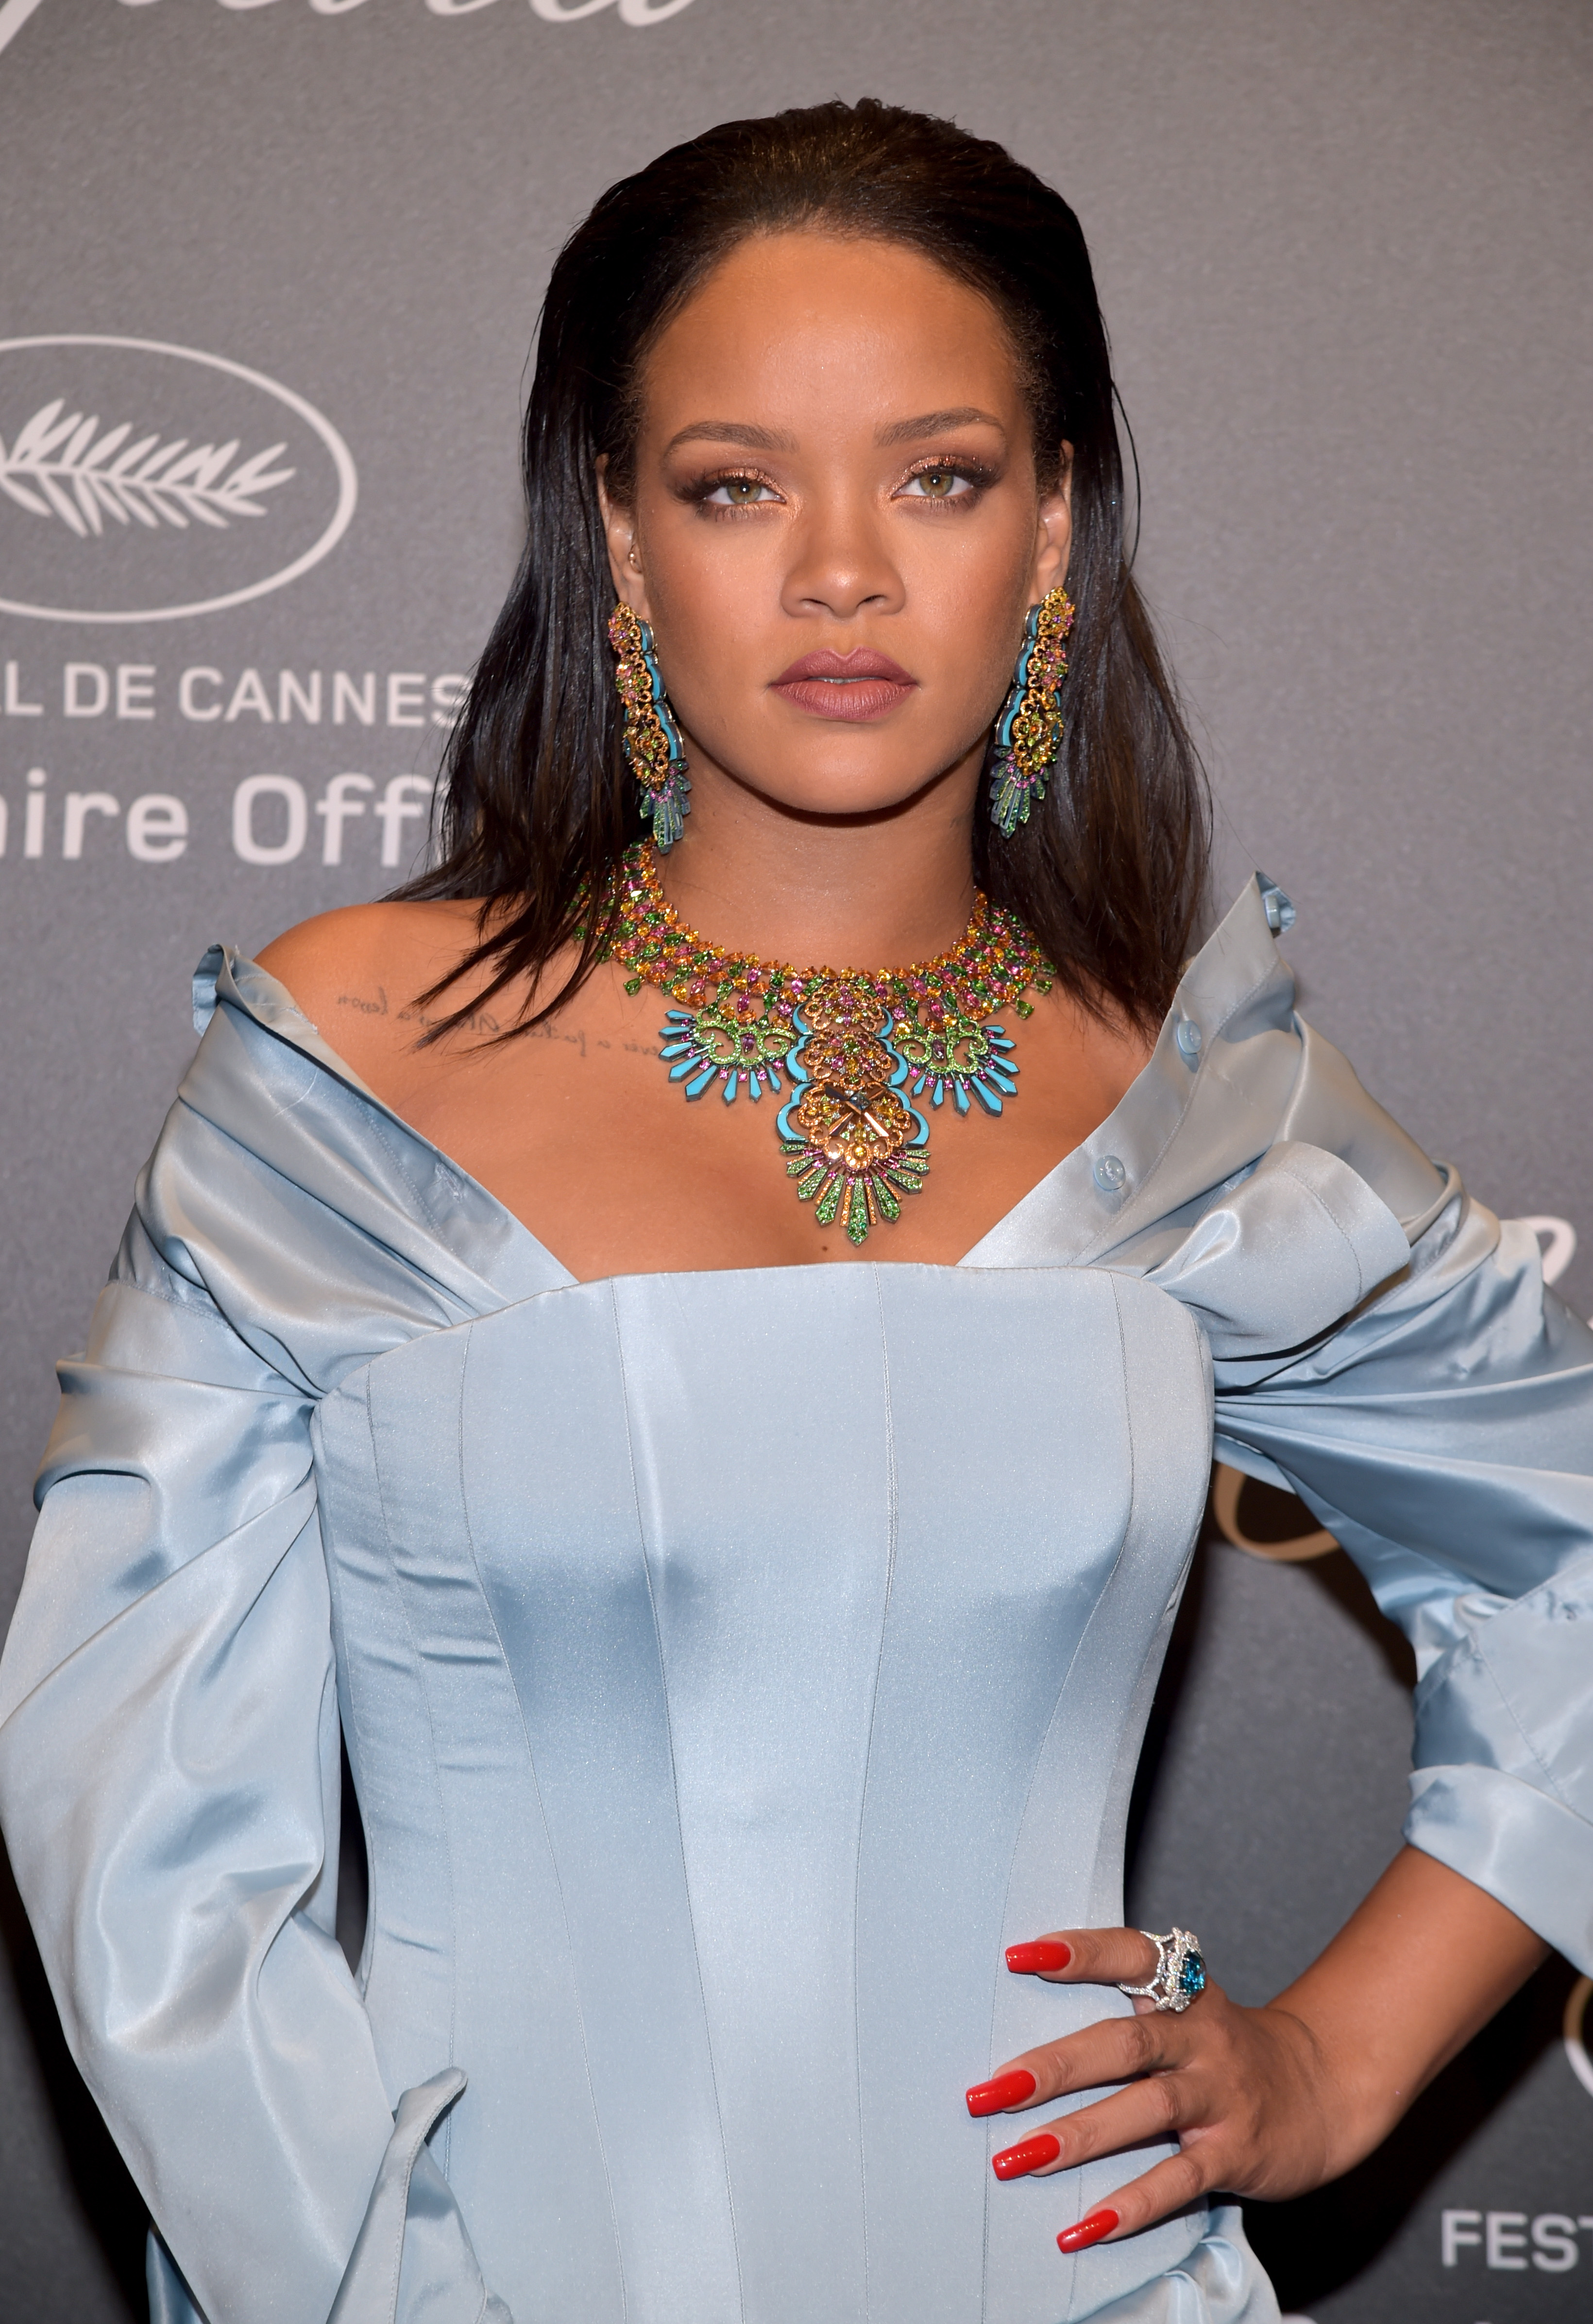 Rihanna, jewelry, joyas, Cannes, Cannes film festival 2017